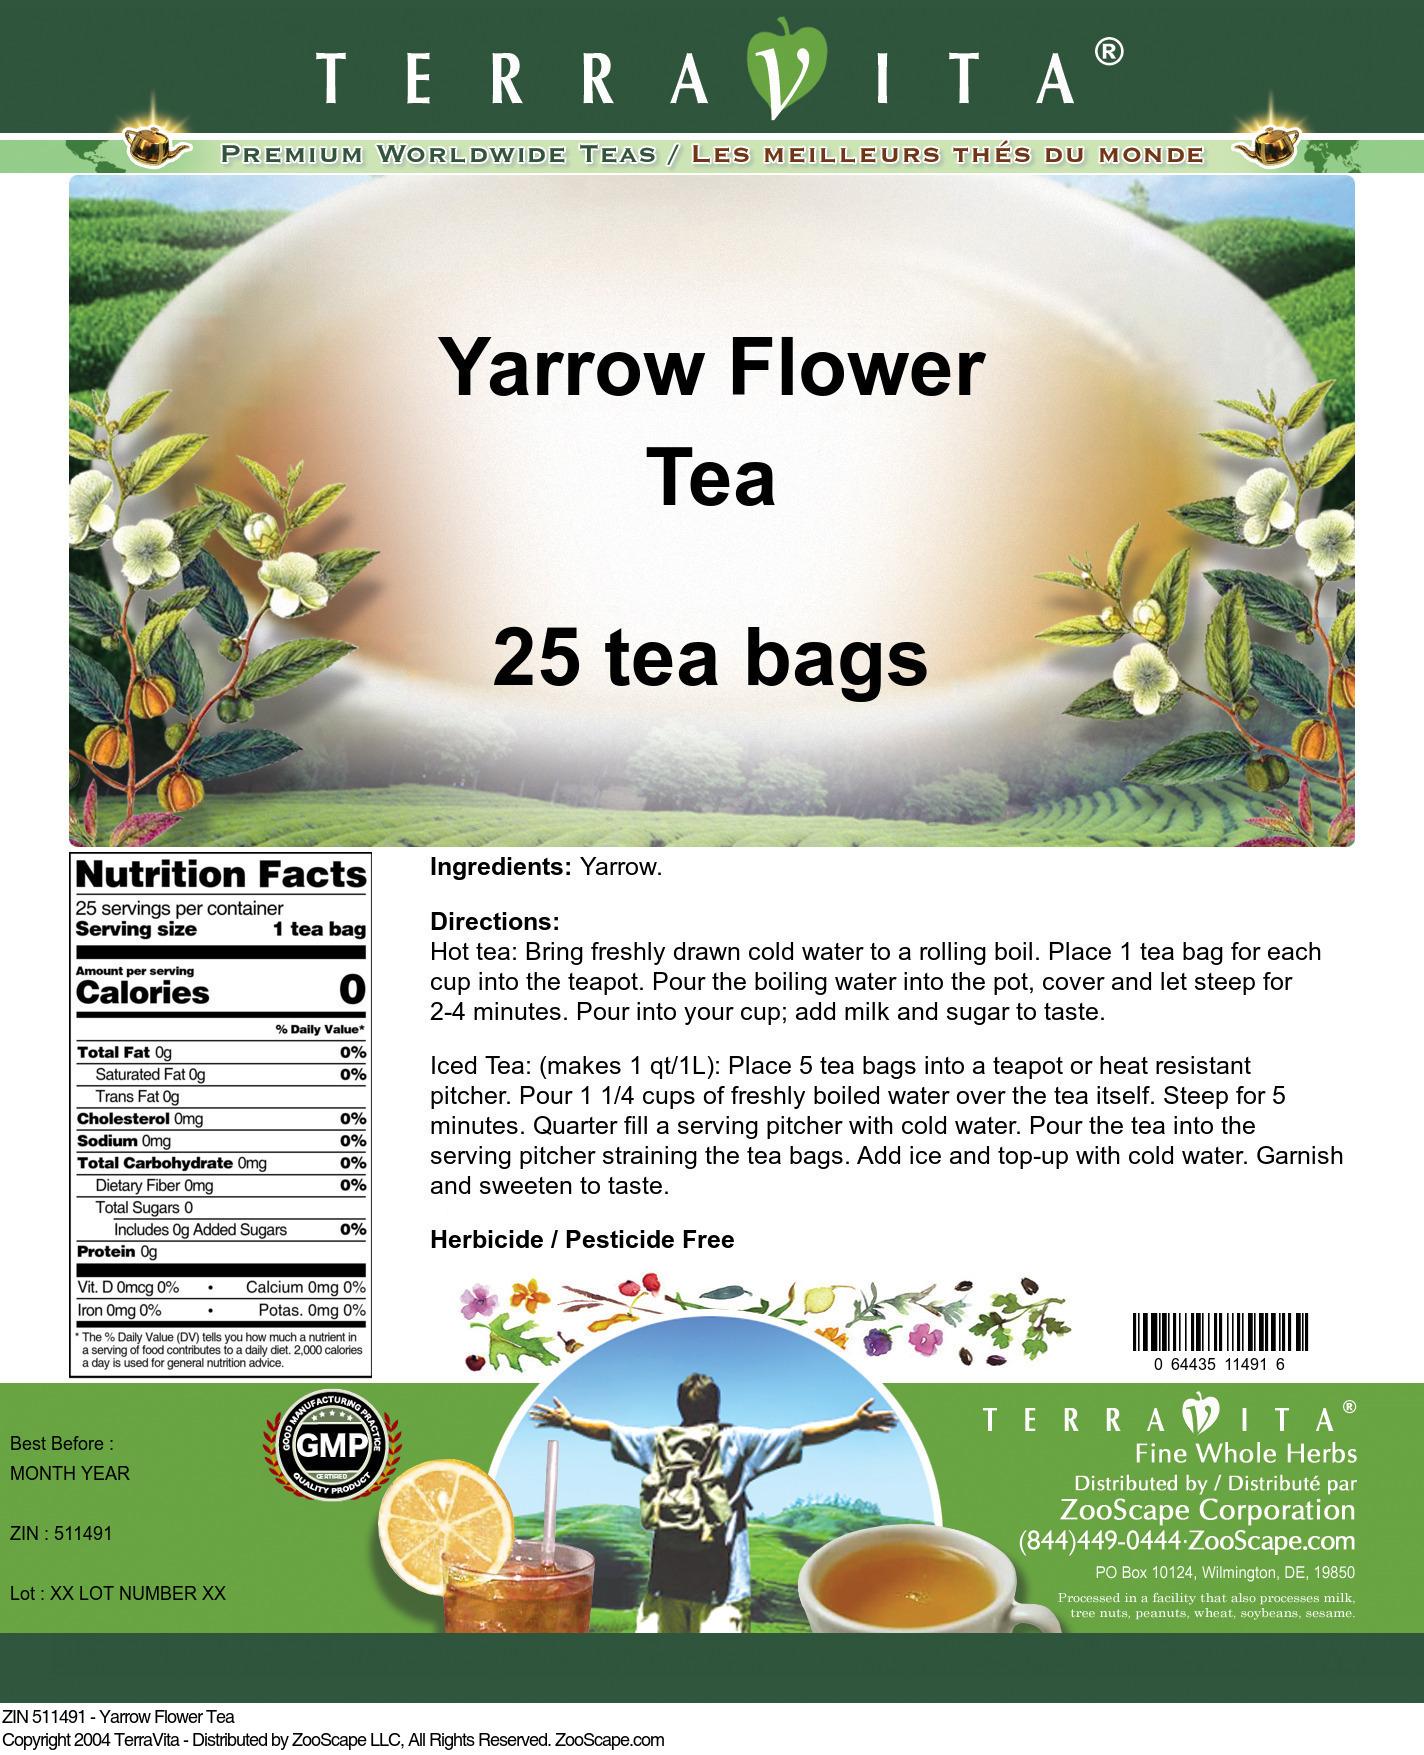 Yarrow Flower Tea